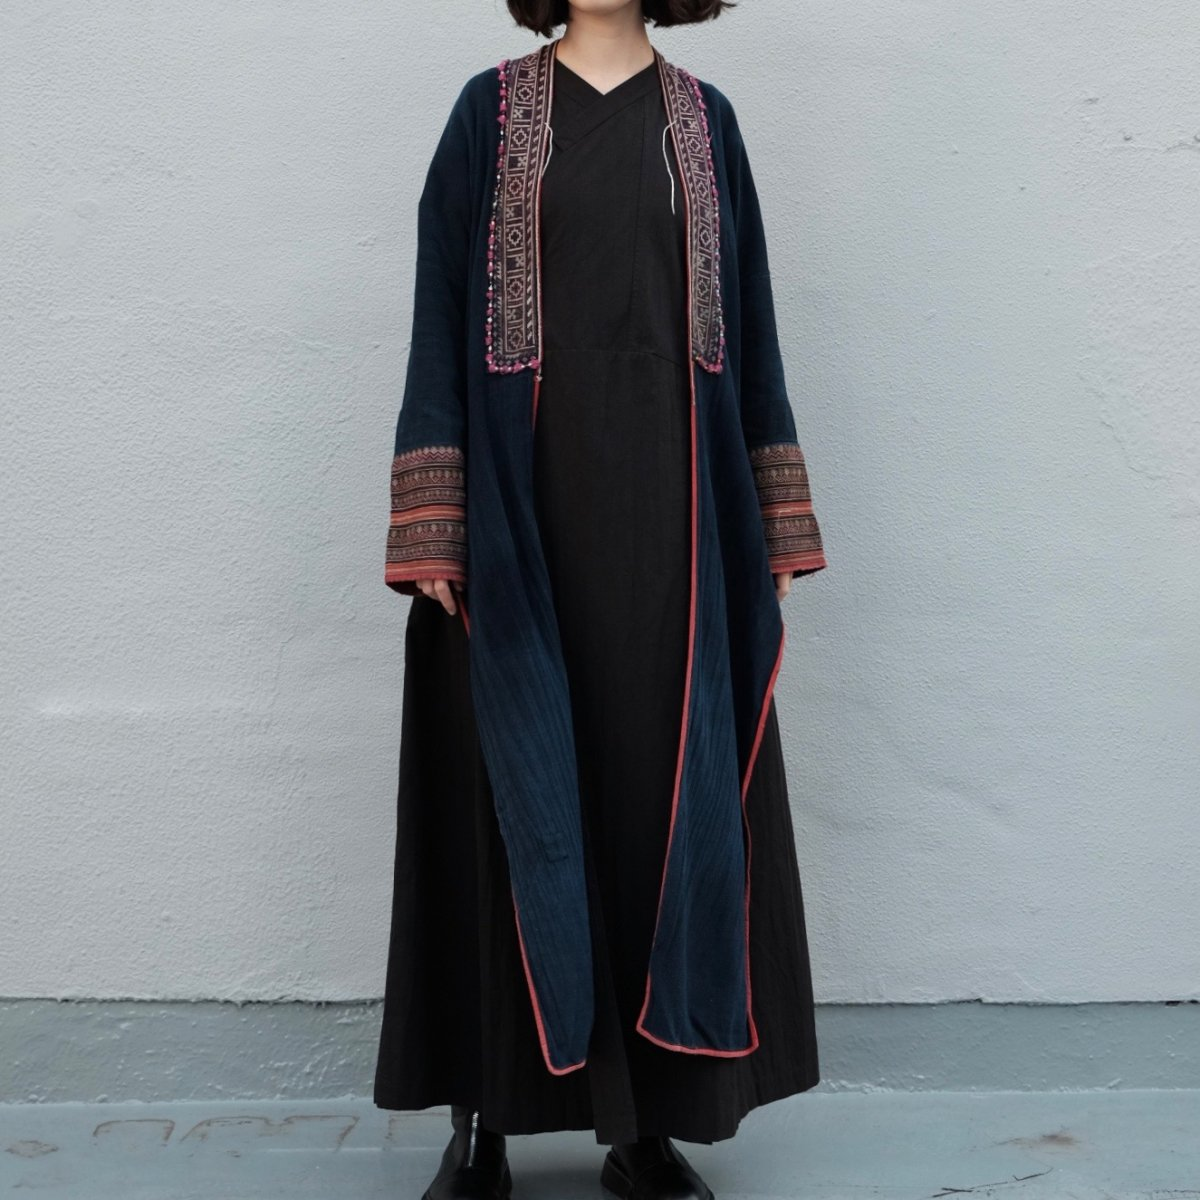 [VINTAGE] Yao People's Traditional Long Jacket by Boinu